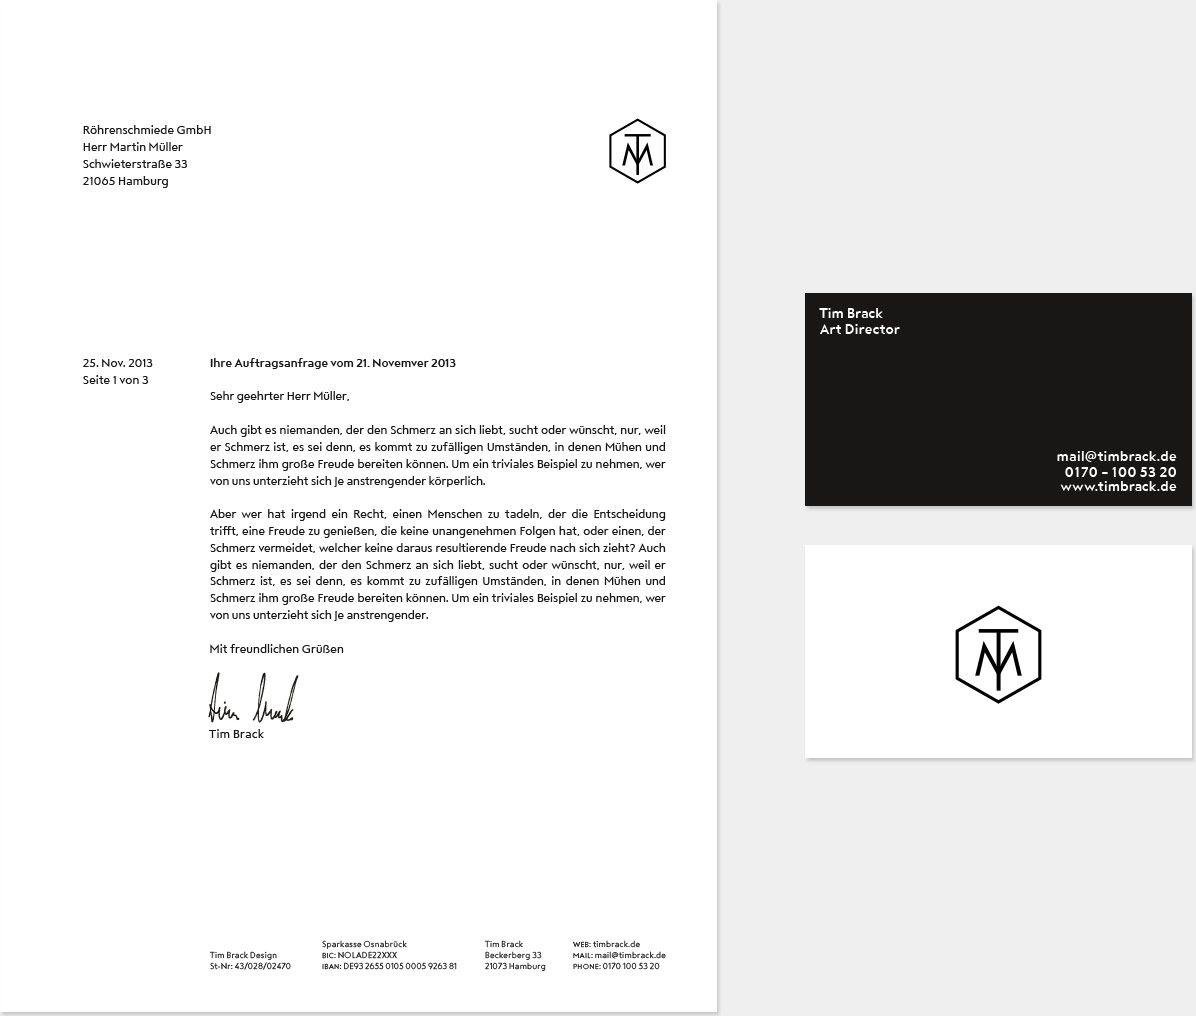 tim brack design briefbogen und visitenkarte corporate design pinterest. Black Bedroom Furniture Sets. Home Design Ideas